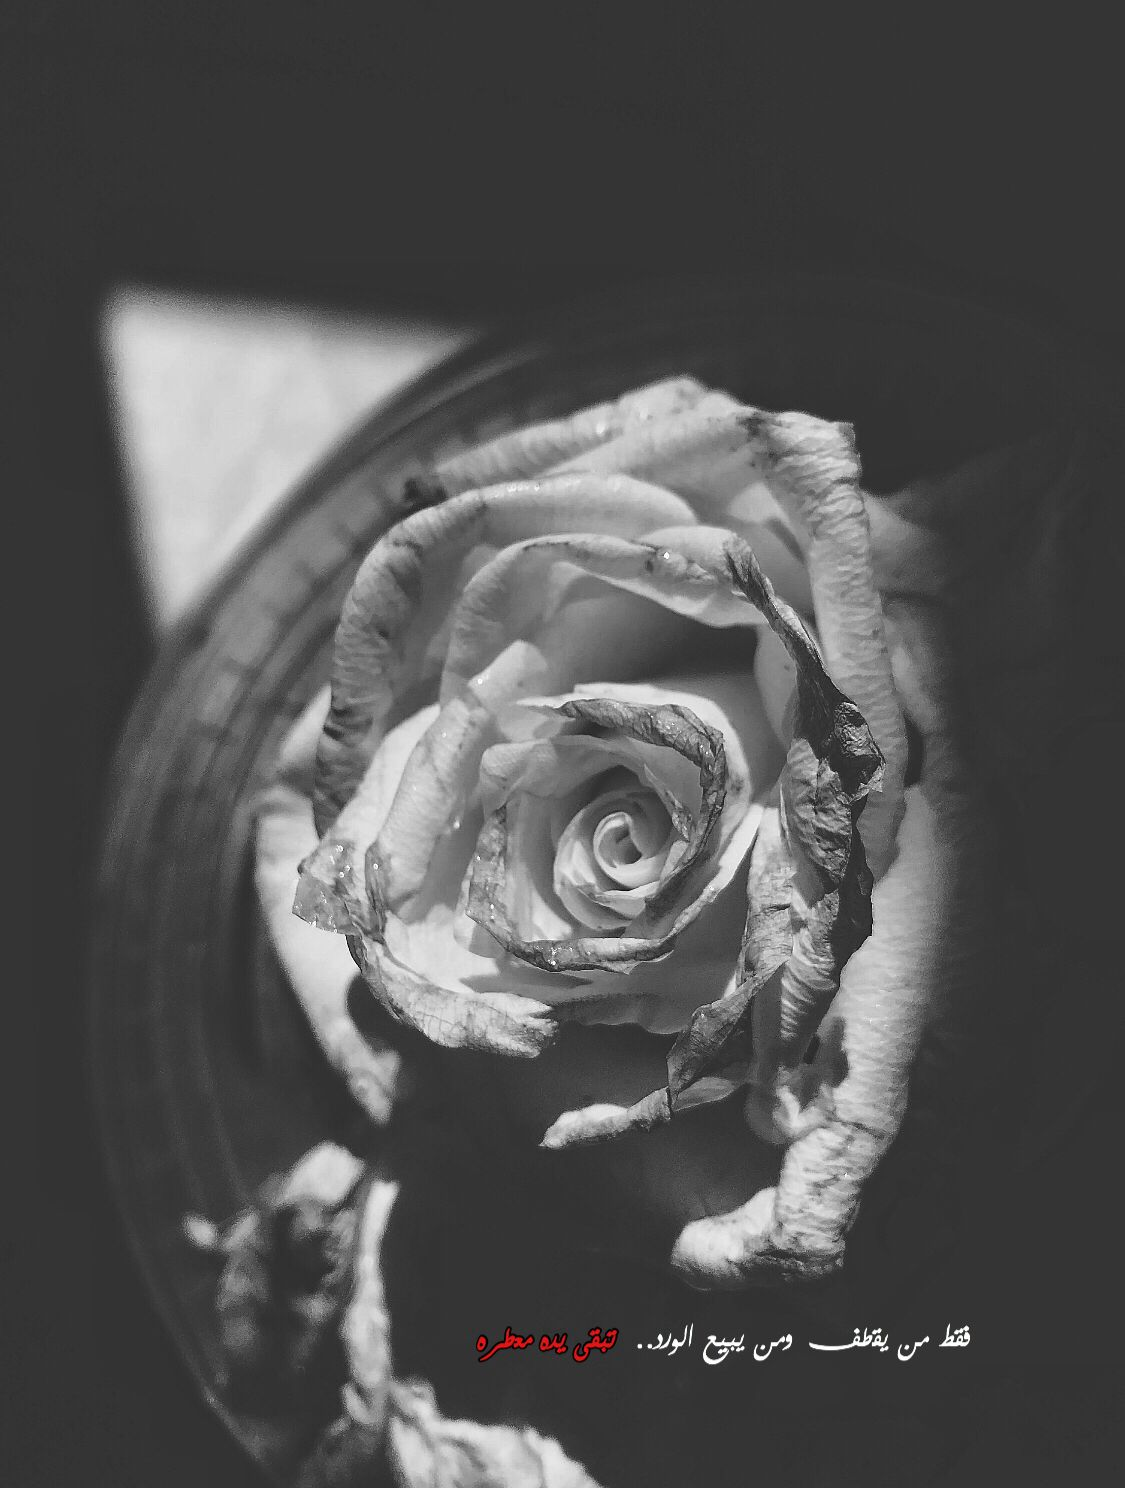 Flowers Photography Quotes ورد اقتباسات تصميم مساء رمزيات Cool Words Words